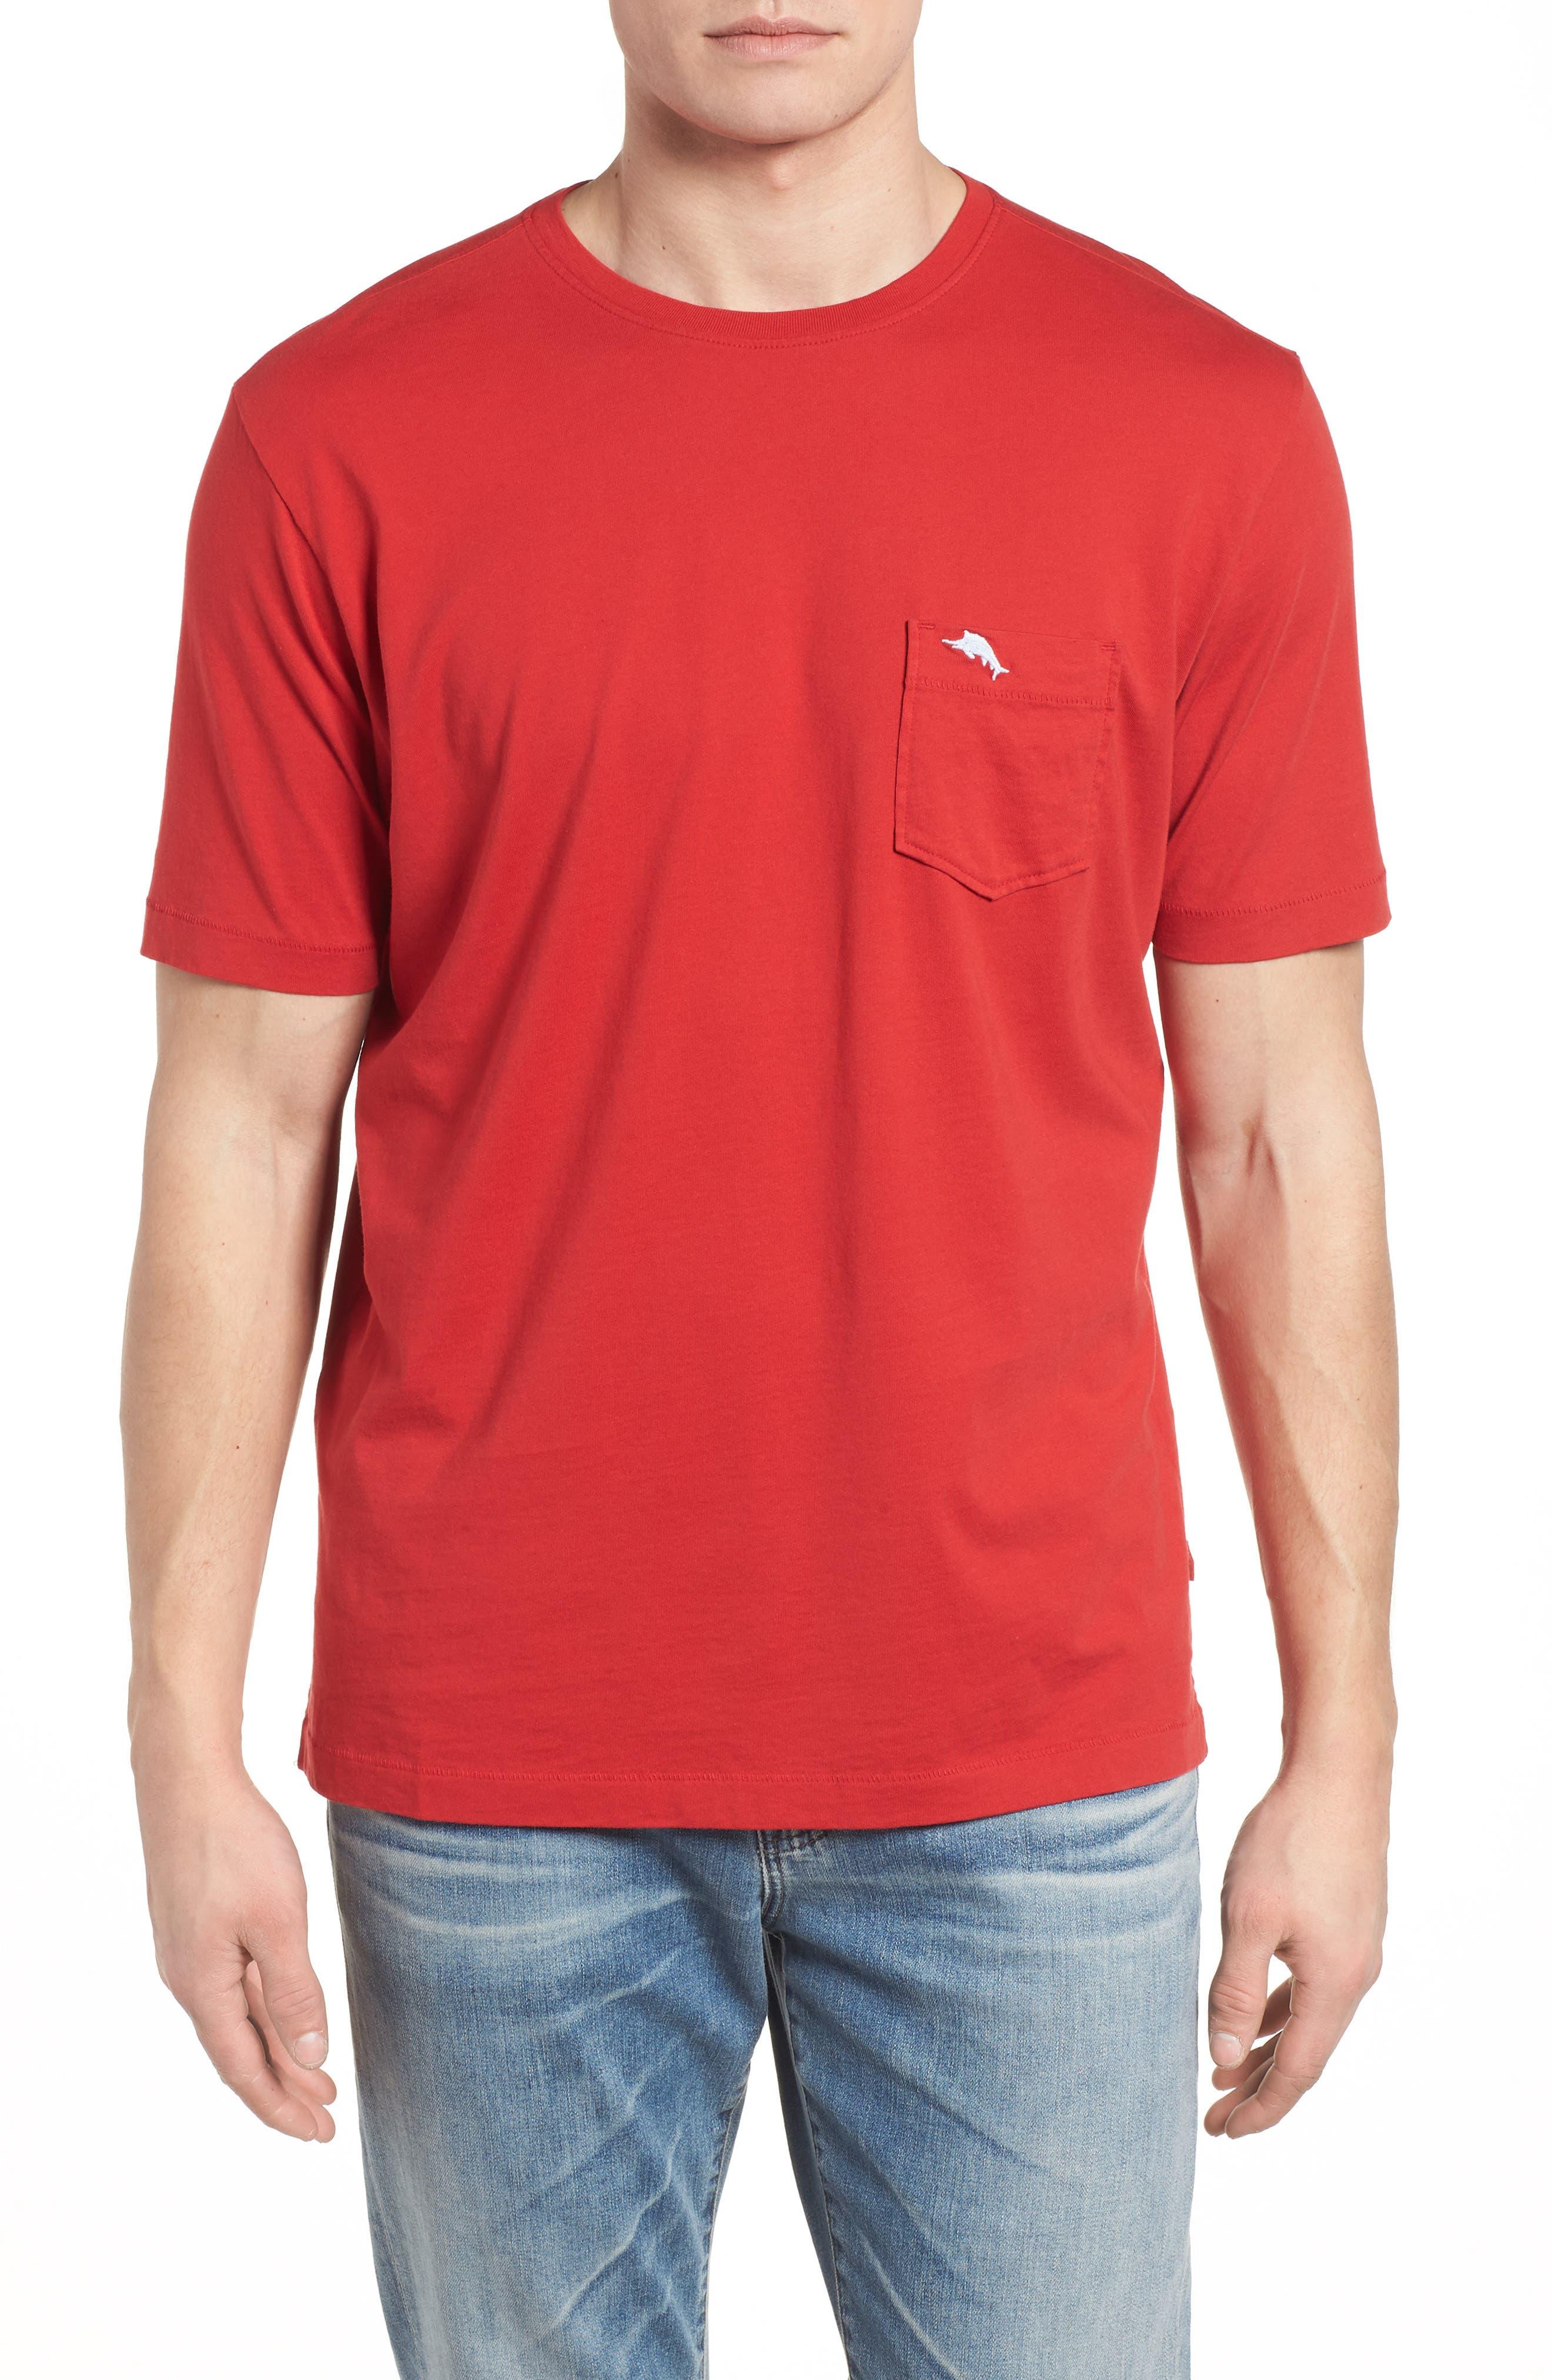 Tommy Bahama Bali Skyline T-Shirt